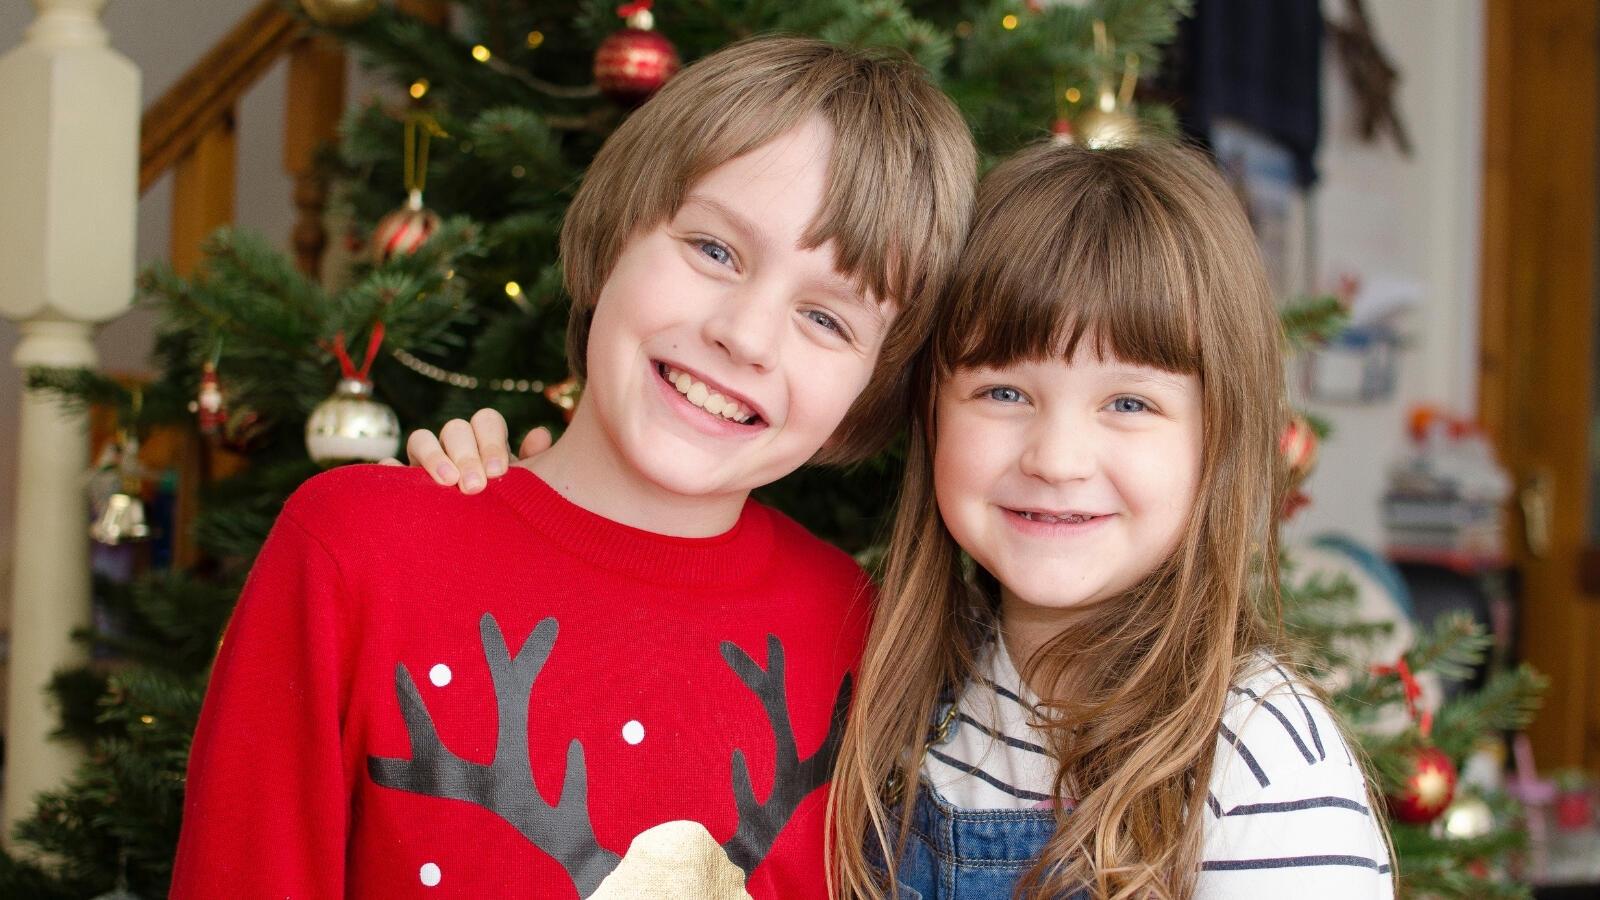 Siblings december 2020